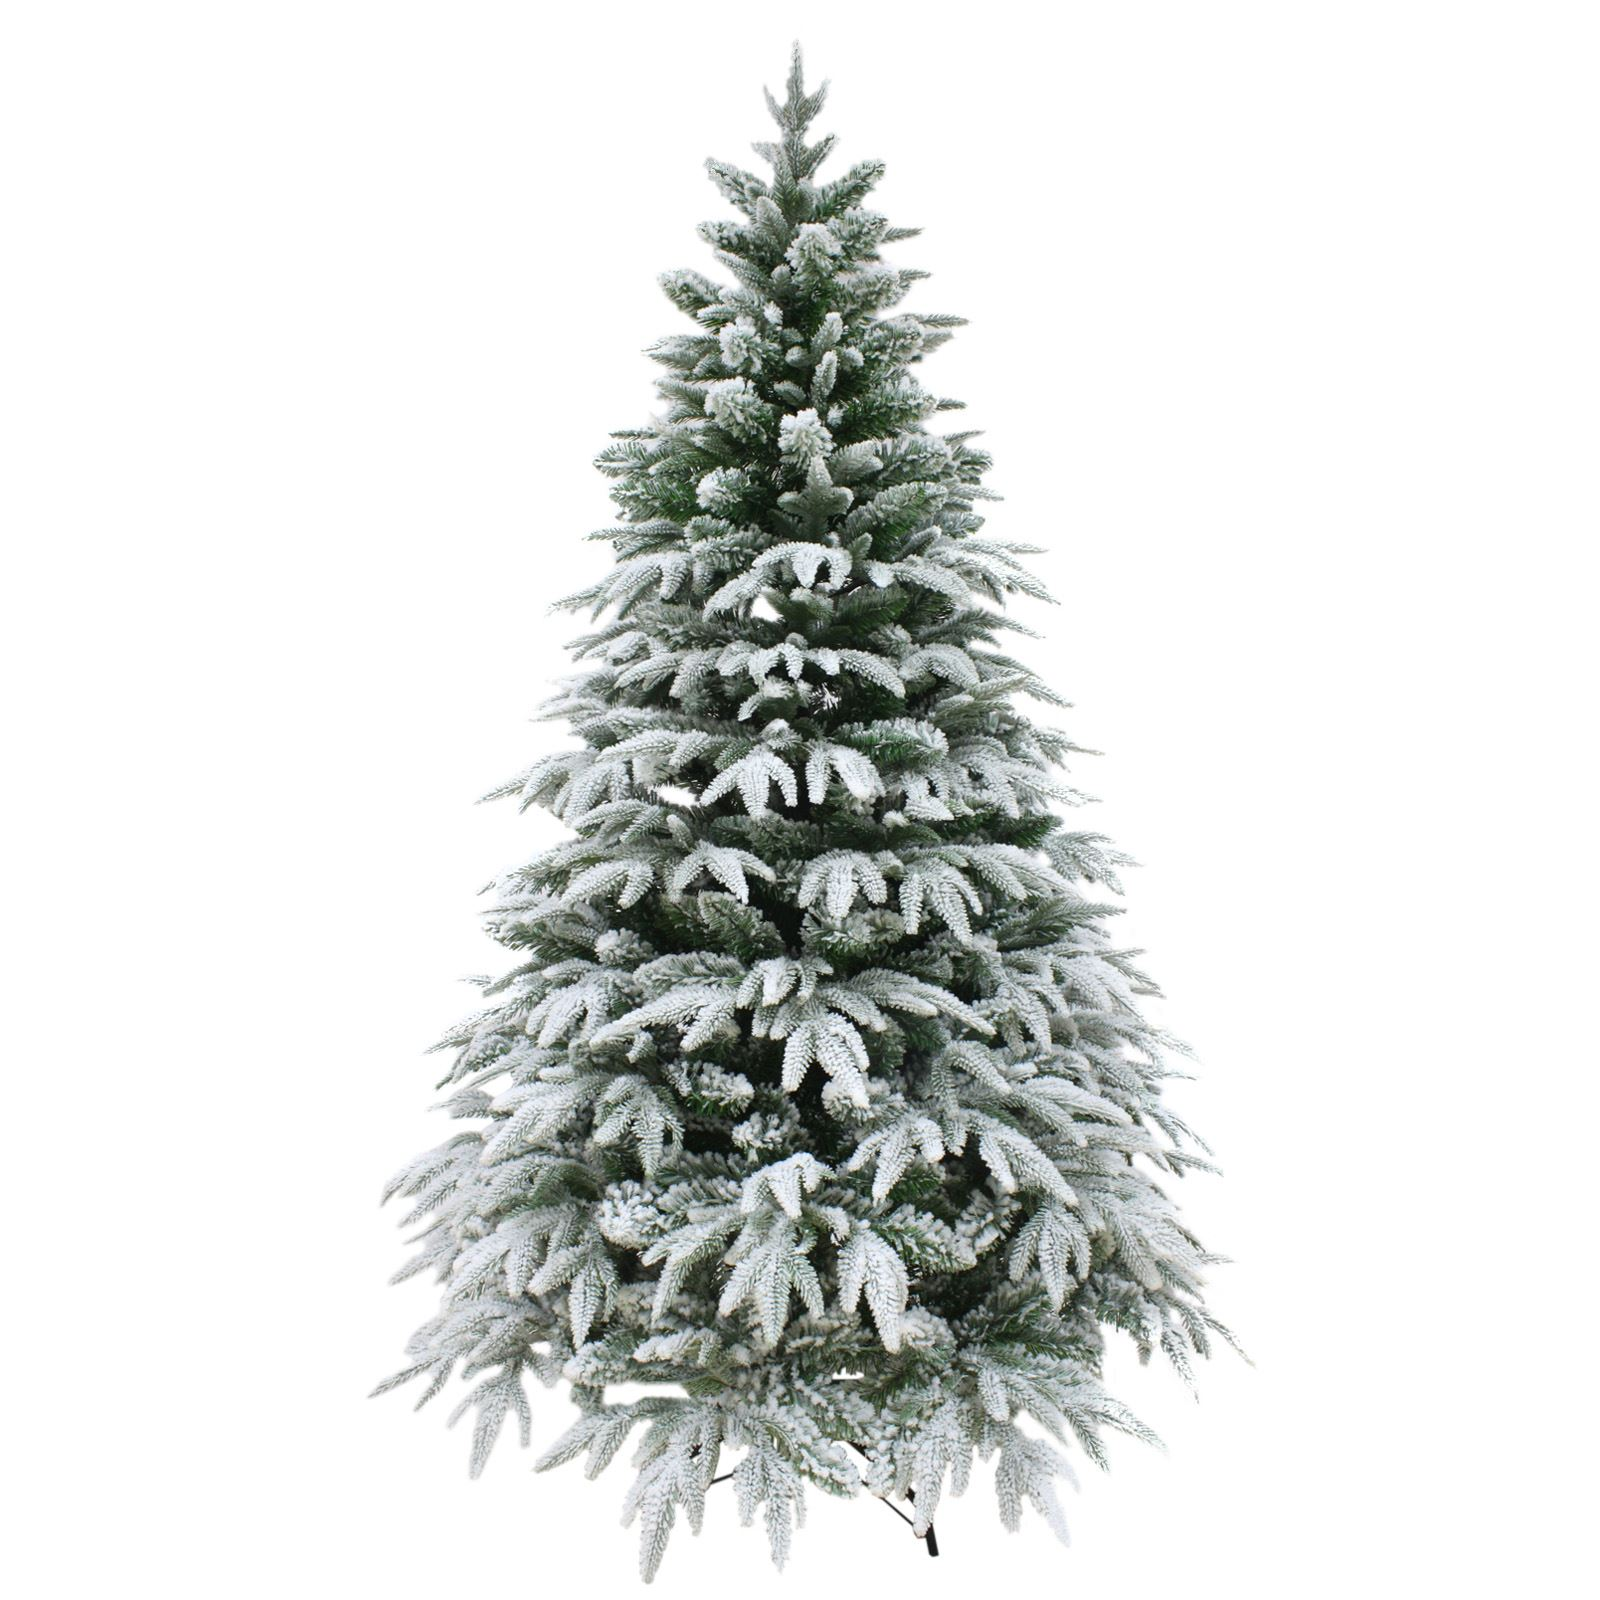 Luxury Snow Tipped Christmas Tree Artificial Pine Indoor Xmas Decoration